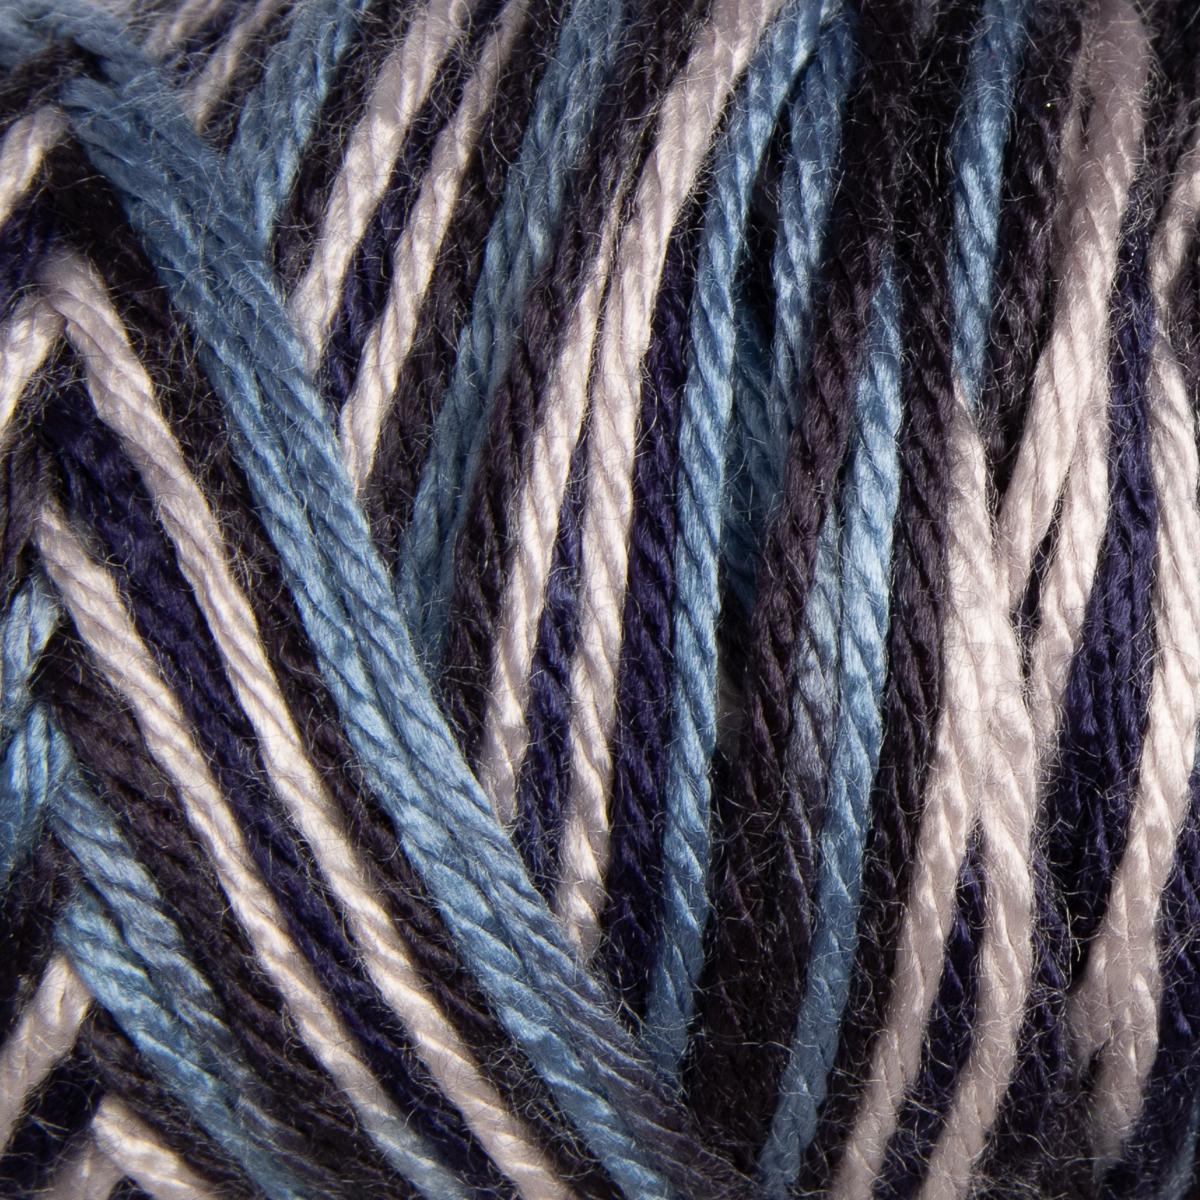 3pk Caron Simply Soft Camo 100/% Acrylic Yarn Medium #4 Knit Crochet Skeins Soft